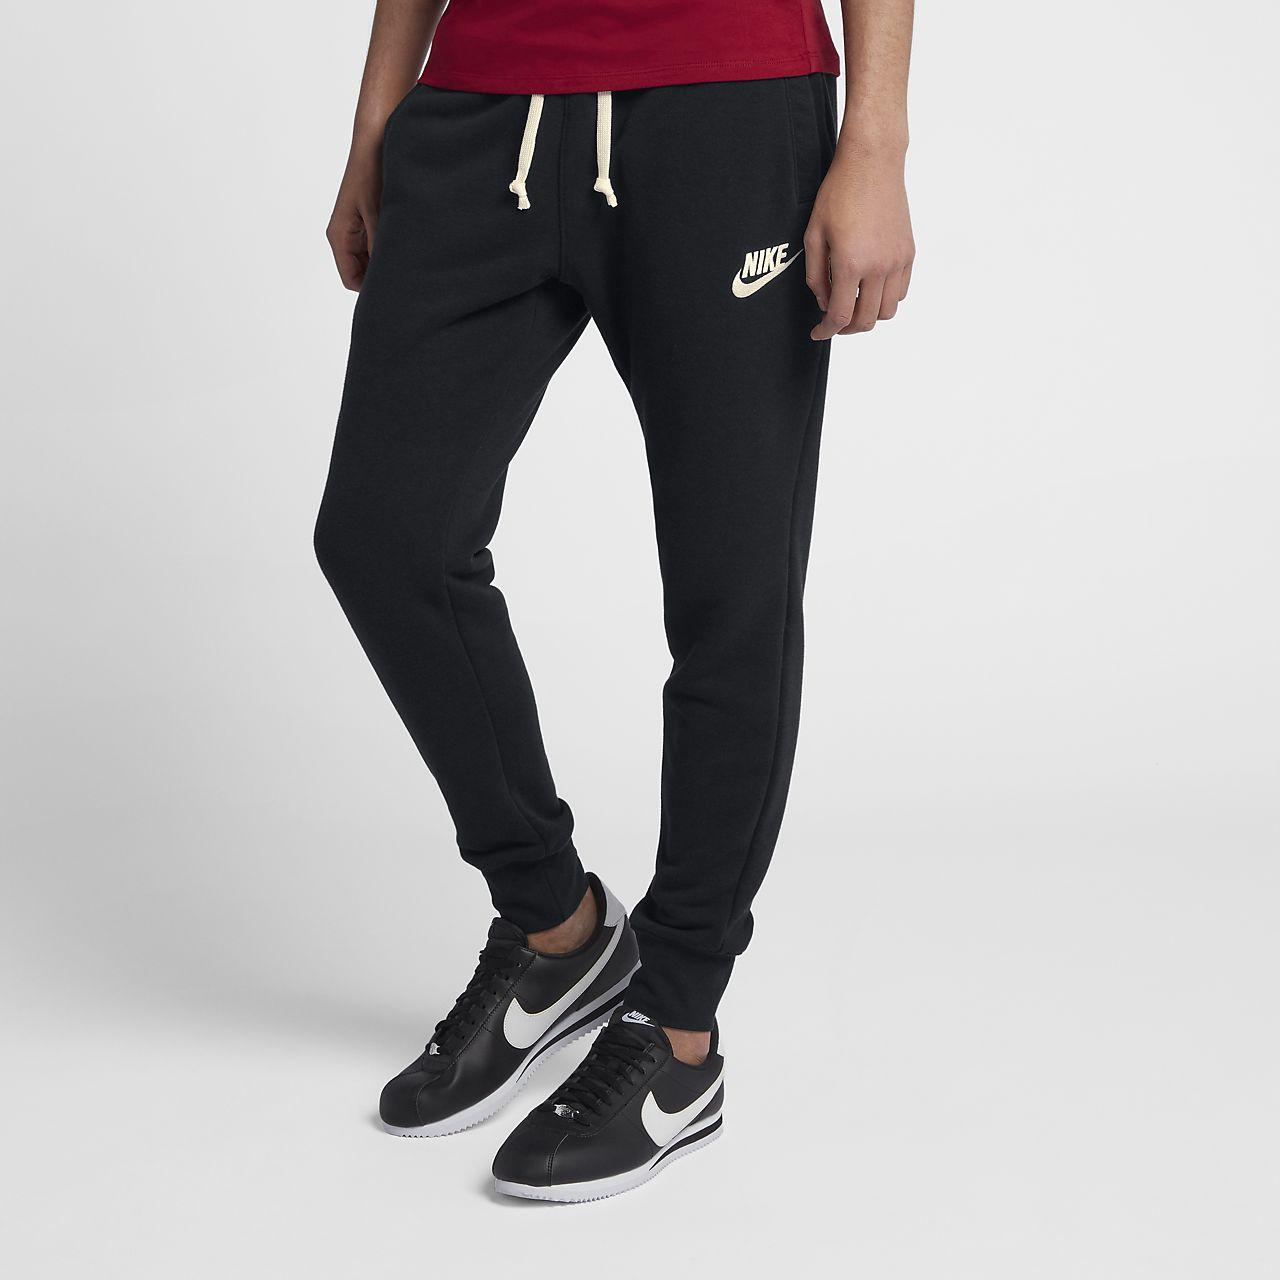 d7767639fb8f Low Resolution Nike Sportswear Heritage Men s Joggers Nike Sportswear  Heritage Men s Joggers